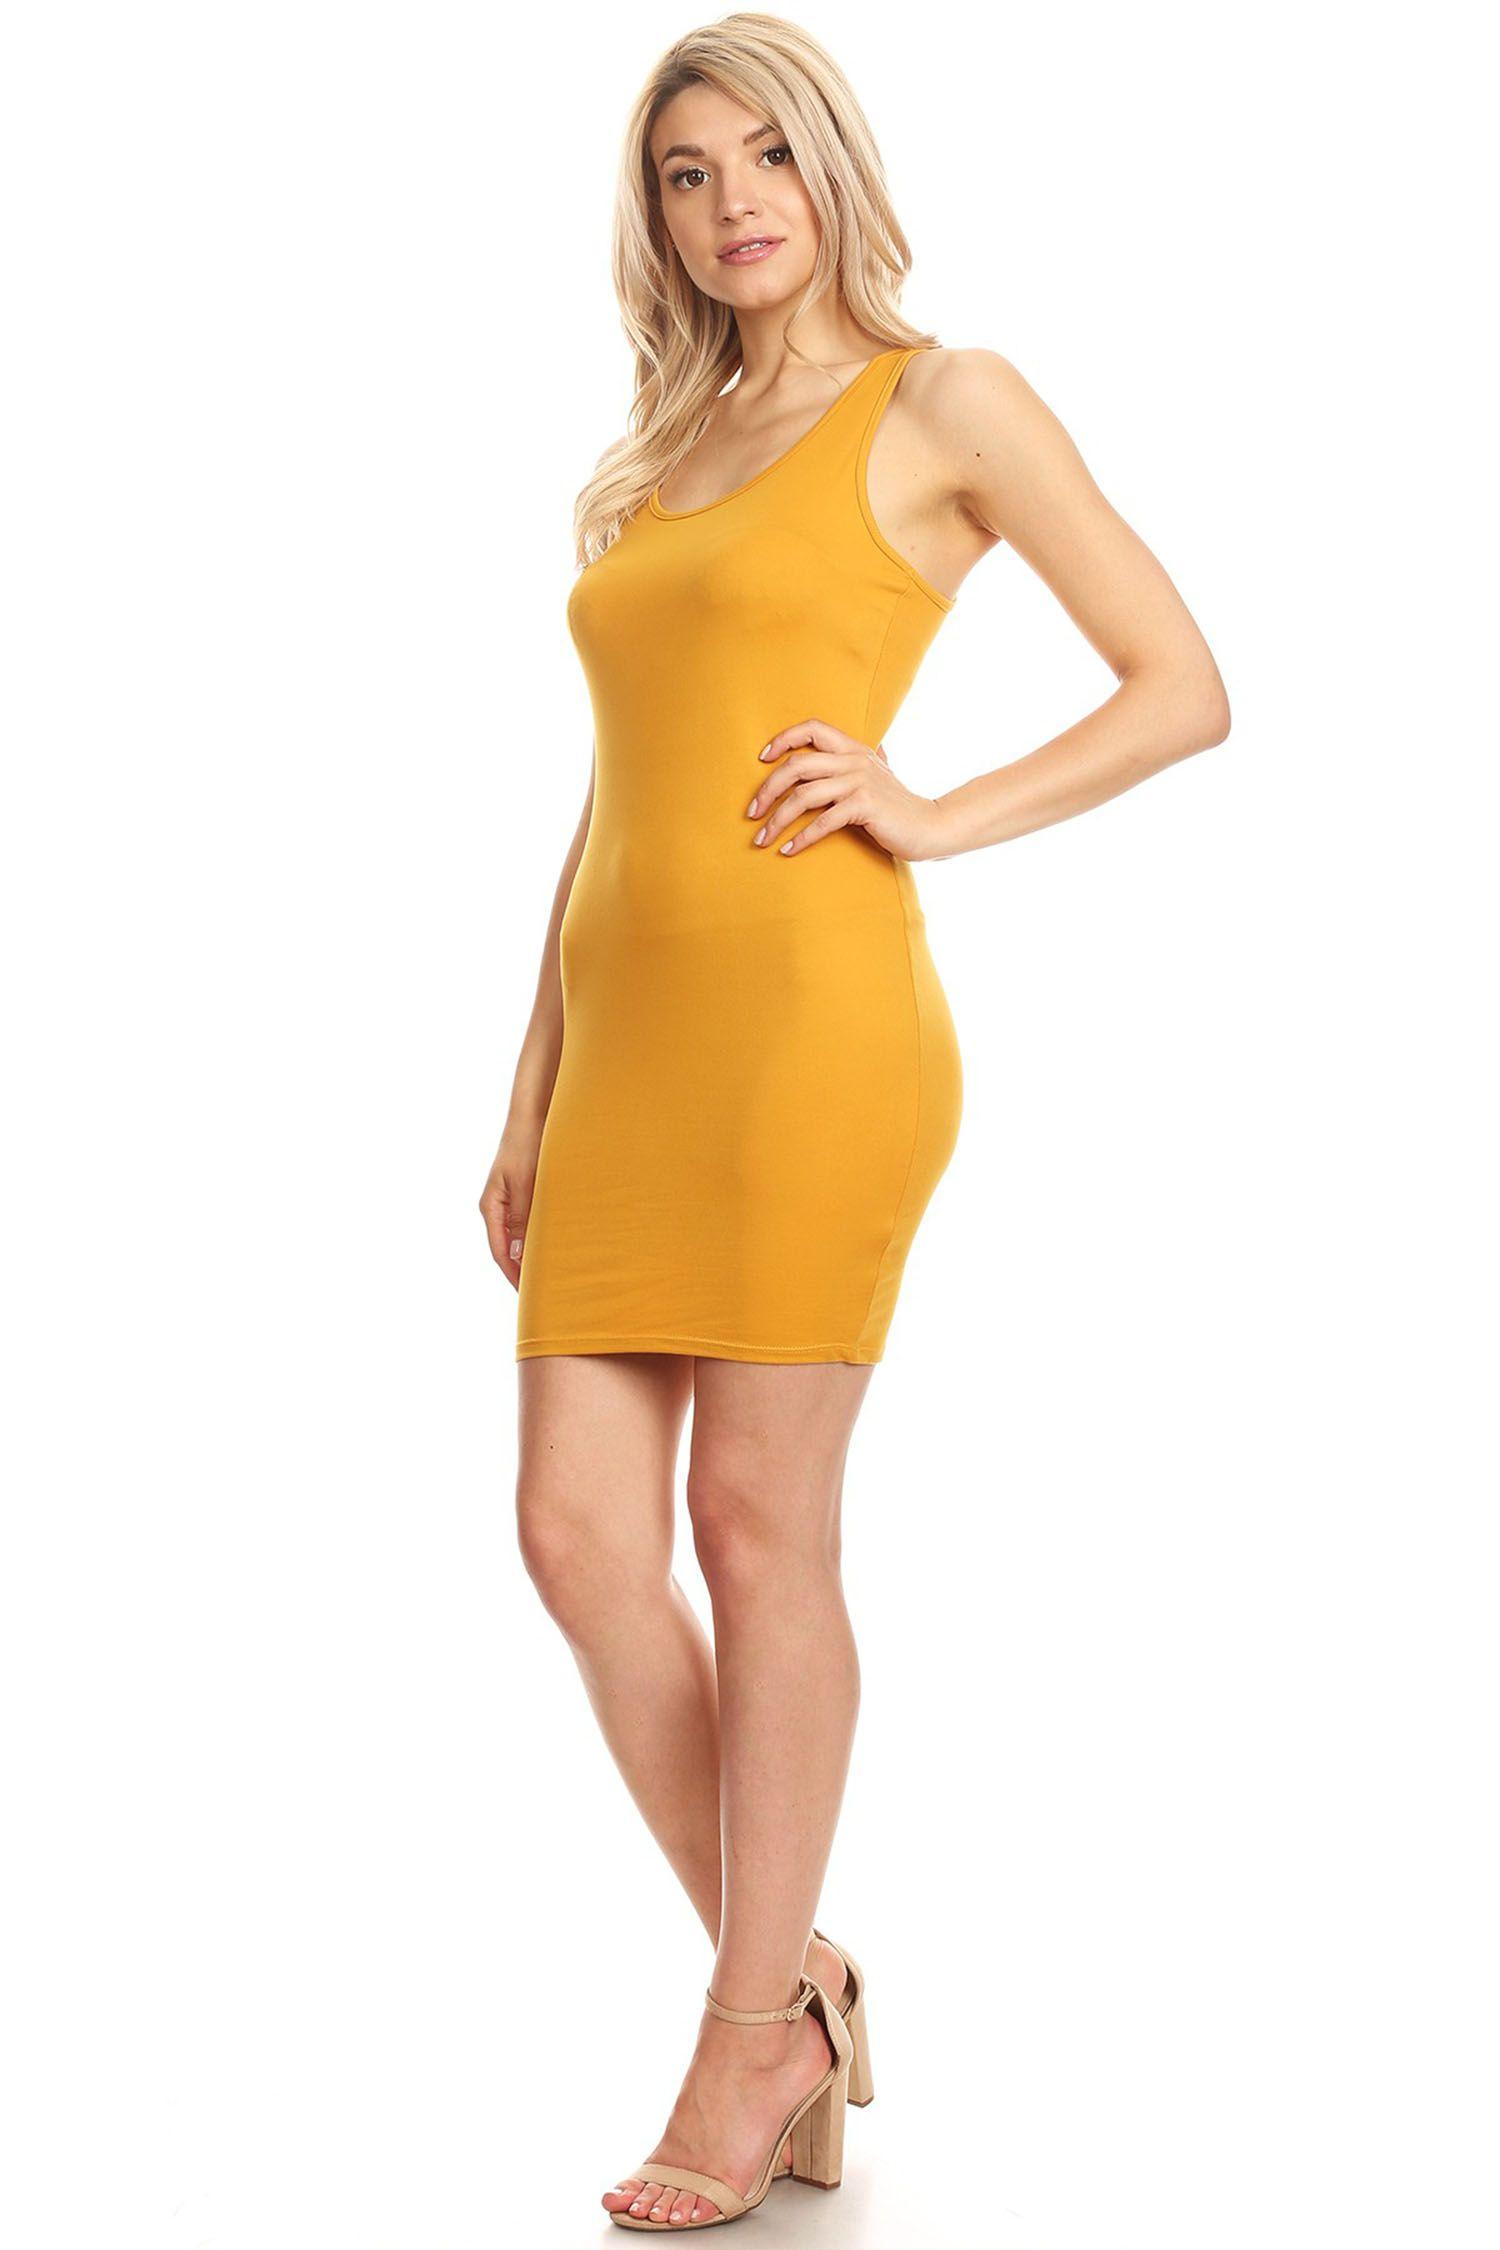 Moa Collection Women S Solid Color Racerback Tank Style Bodycon Dress Walmart Com Bodycon Dress Dresses Midi Dress Bodycon [ 2250 x 1500 Pixel ]